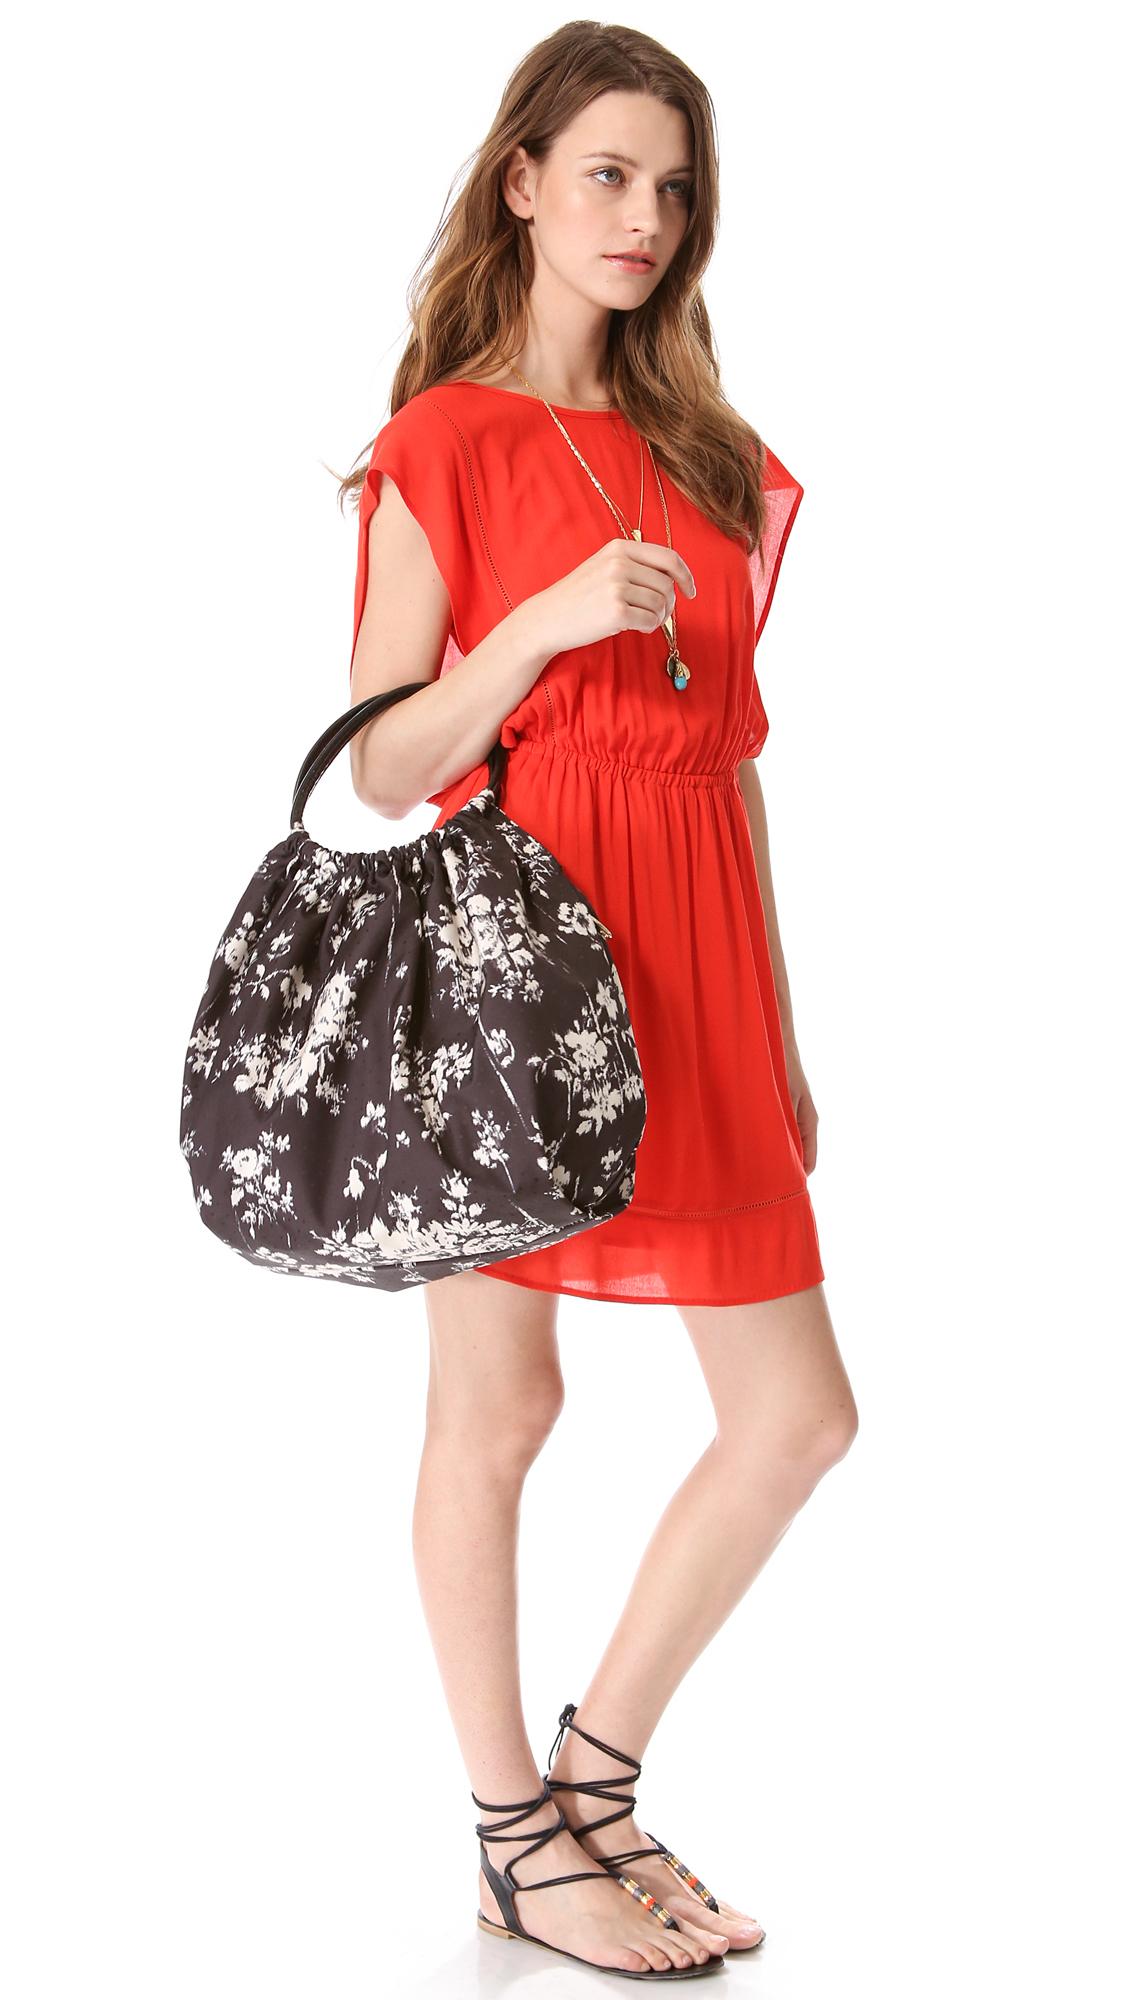 Red Valentino Spring 2016: Red Valentino Balloon Bag In Black